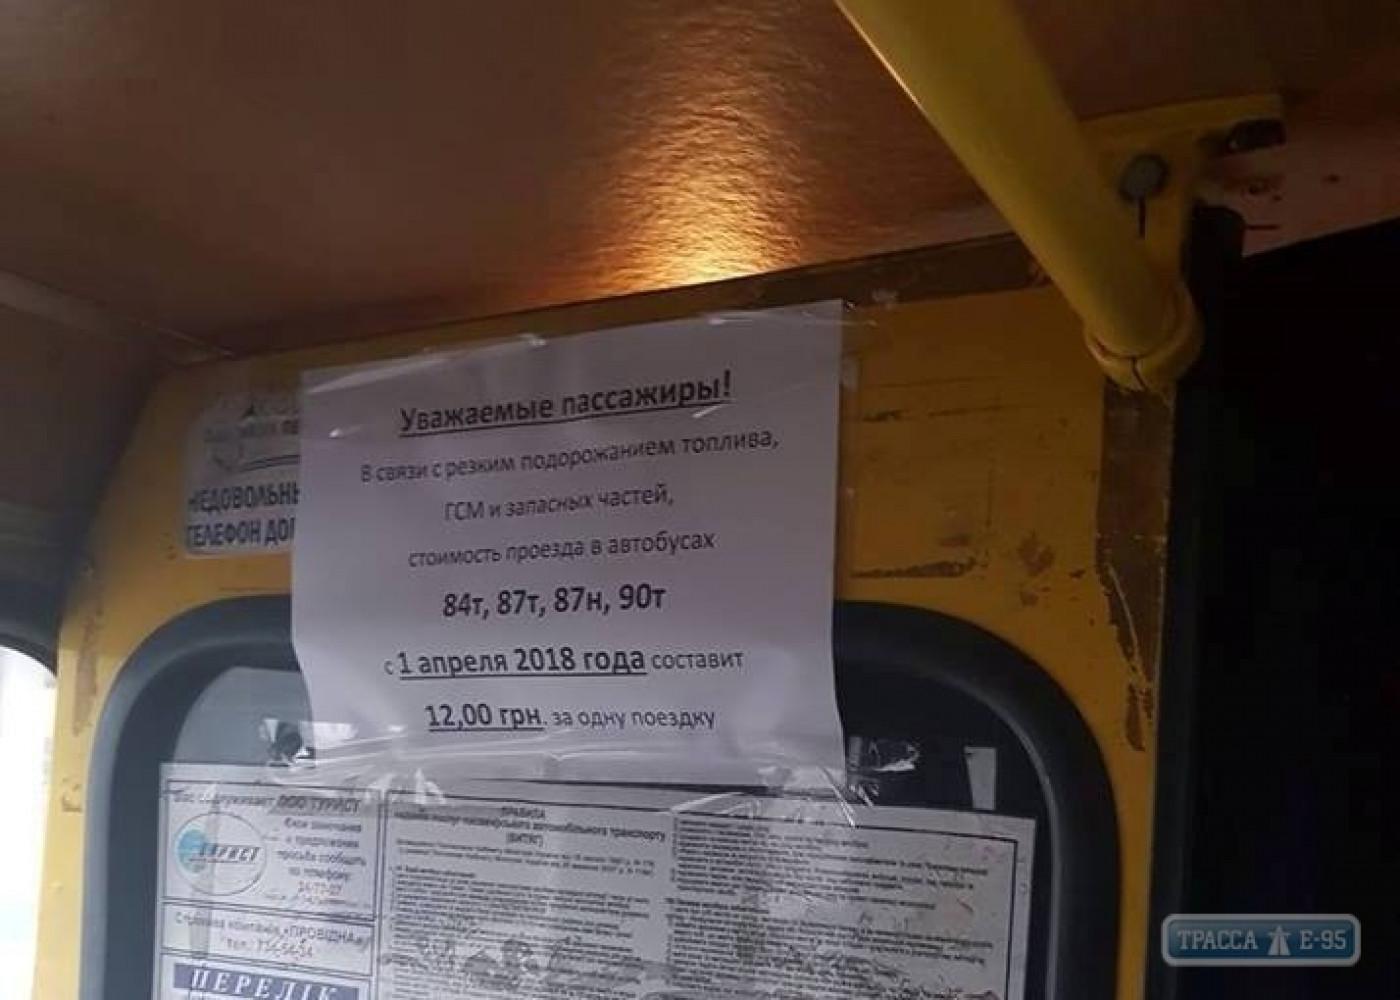 расписание маршруток 570 одесса